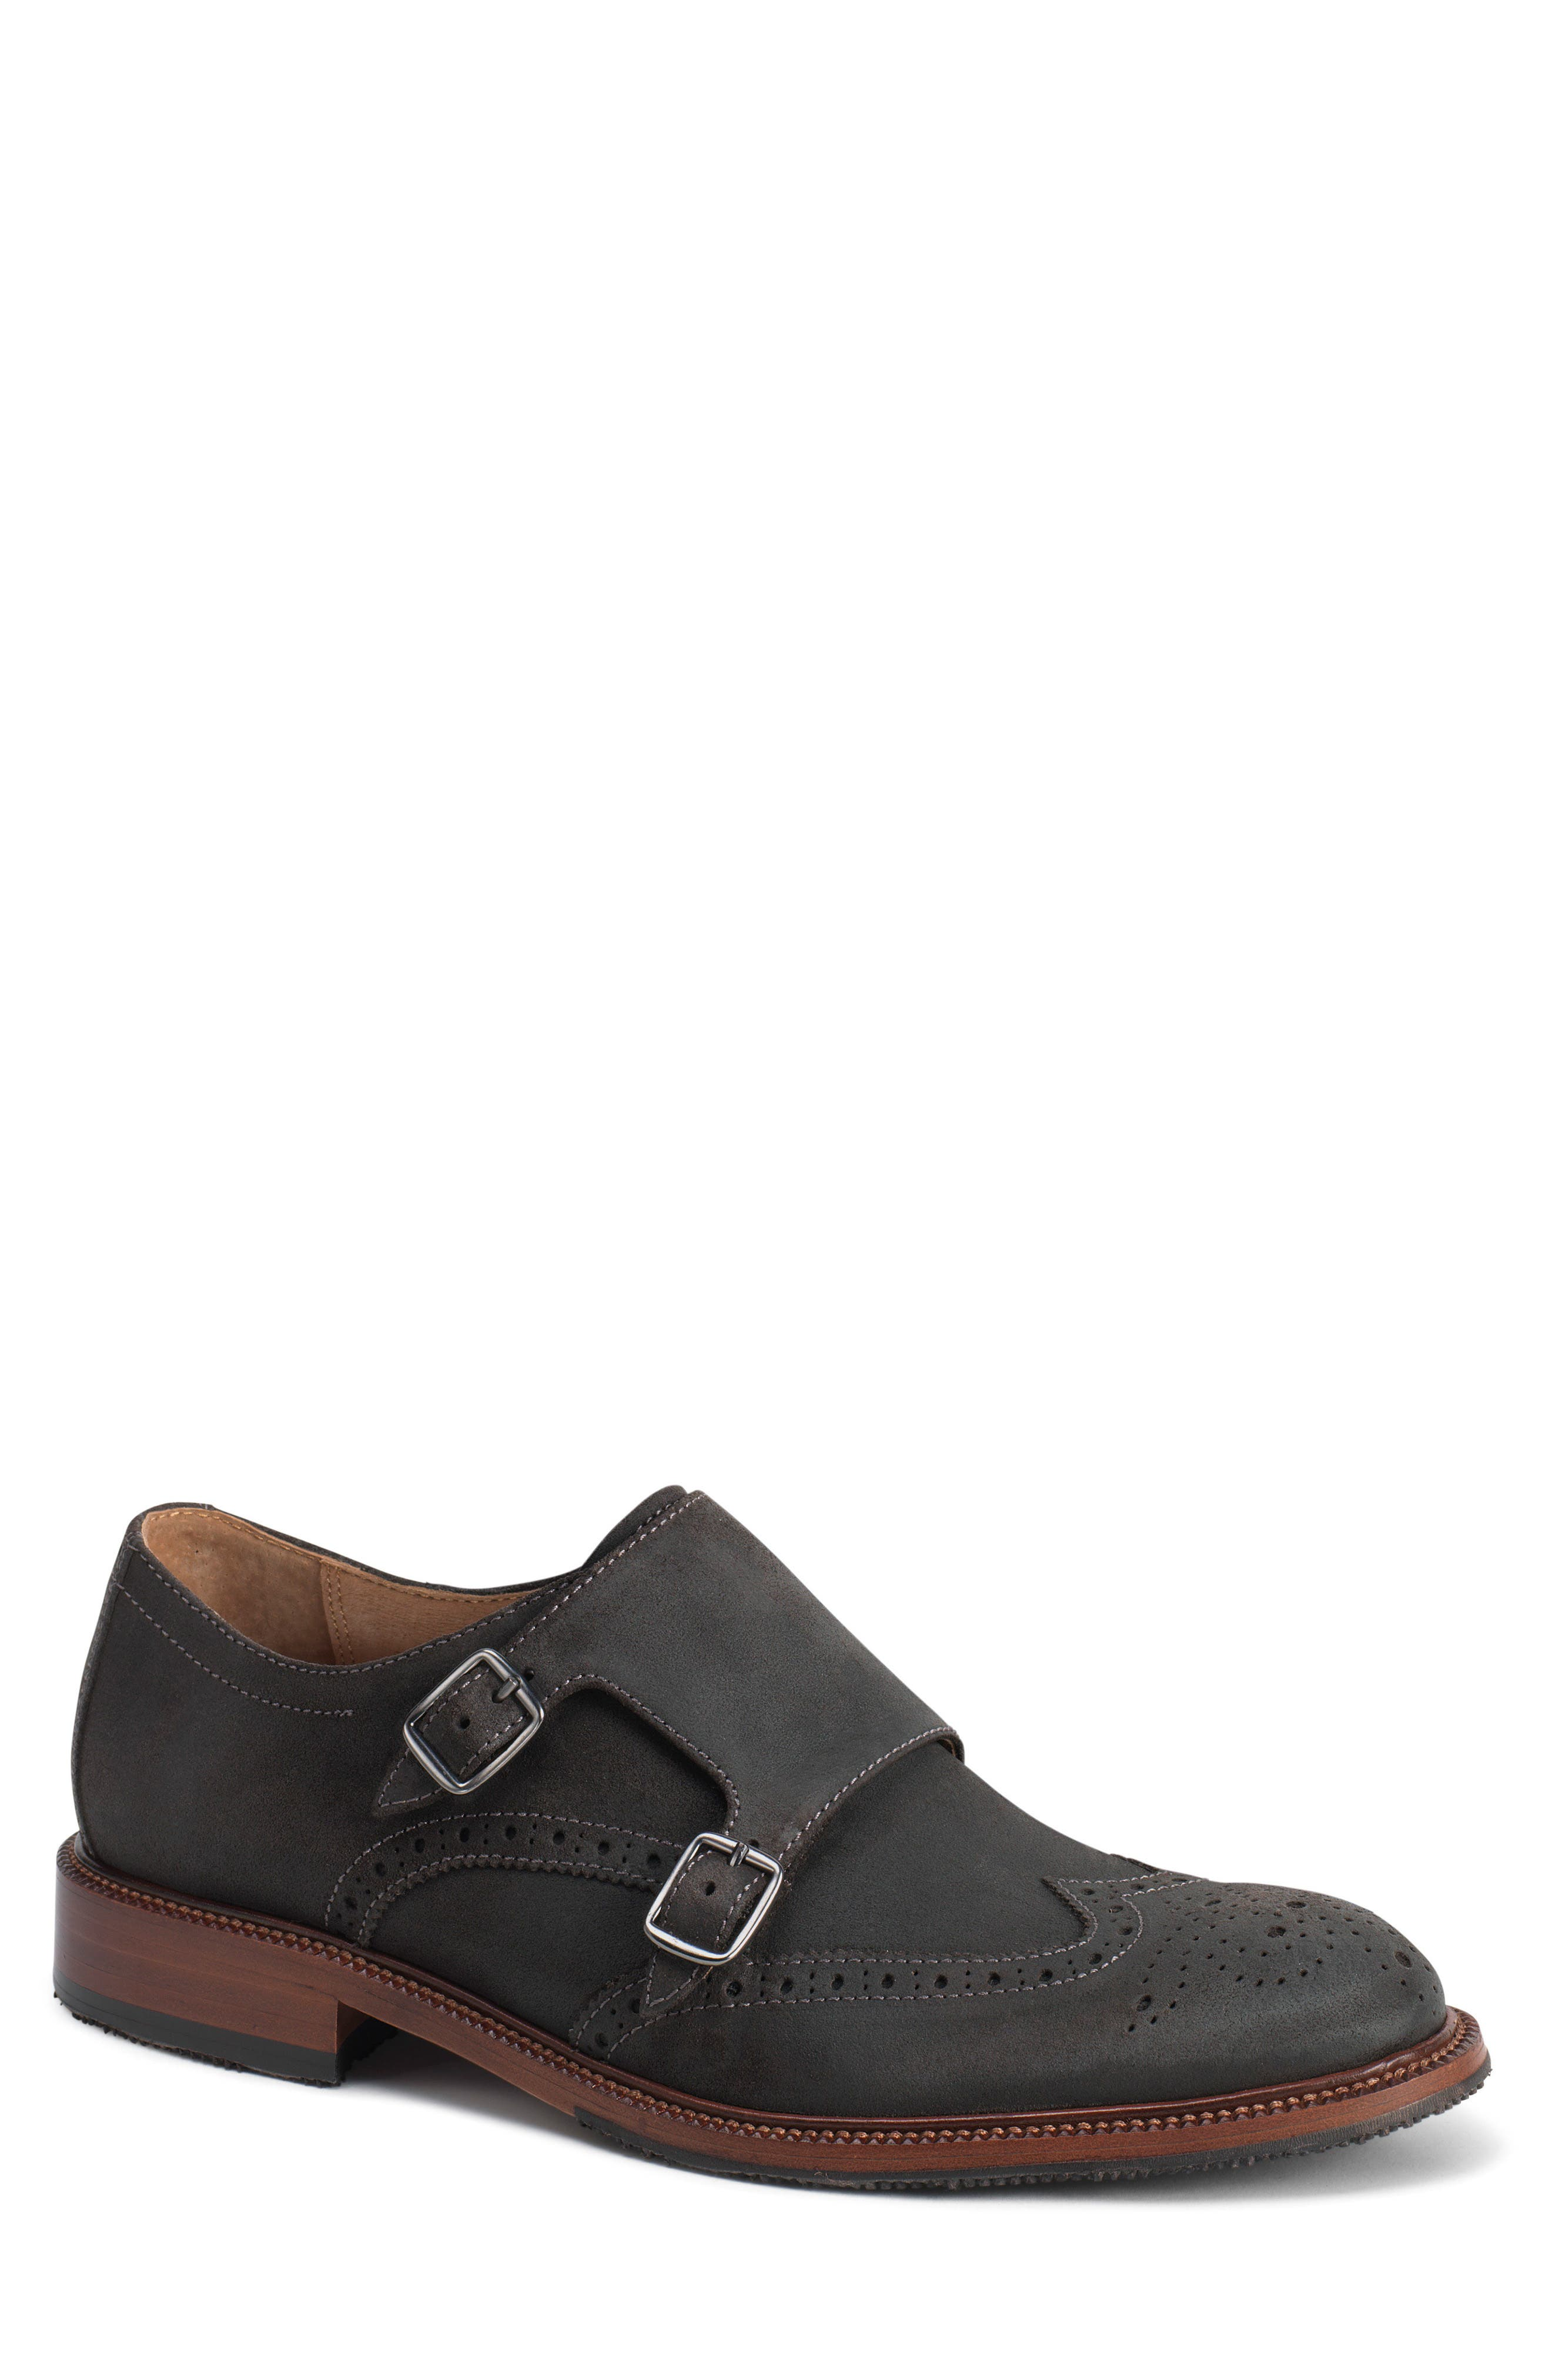 Leland Double Monk Strap Shoe,                             Main thumbnail 1, color,                             GRAY WAXED SUEDE